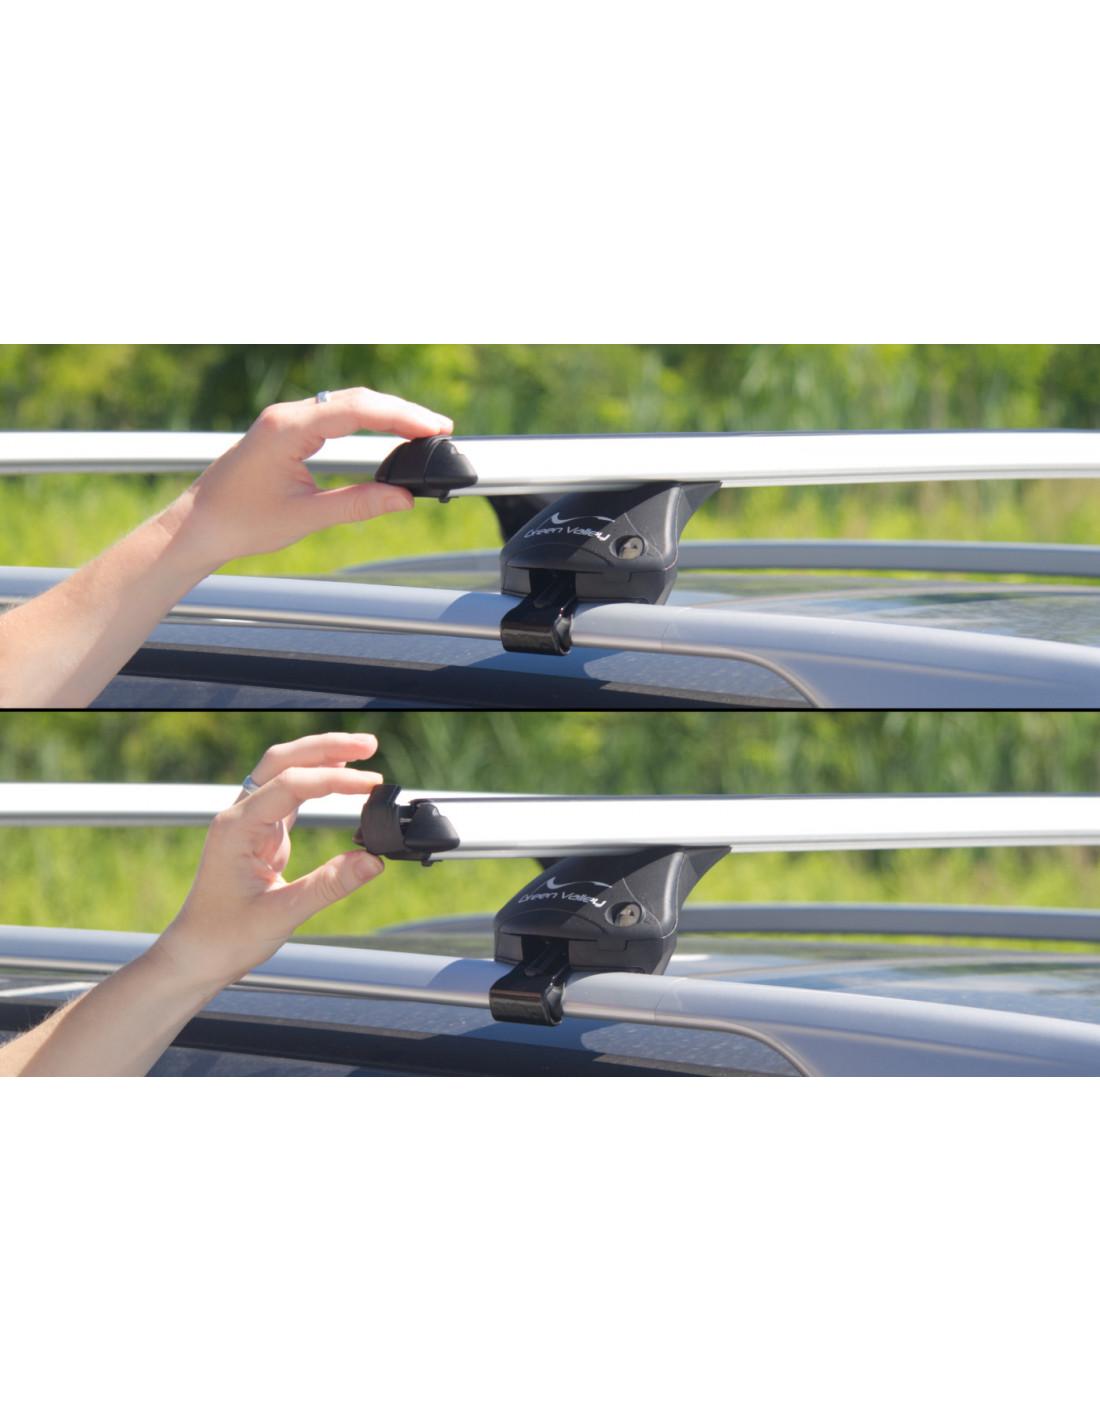 Hak Holowniczy Przykr Cany Chrysler Grand Voyager Stow N